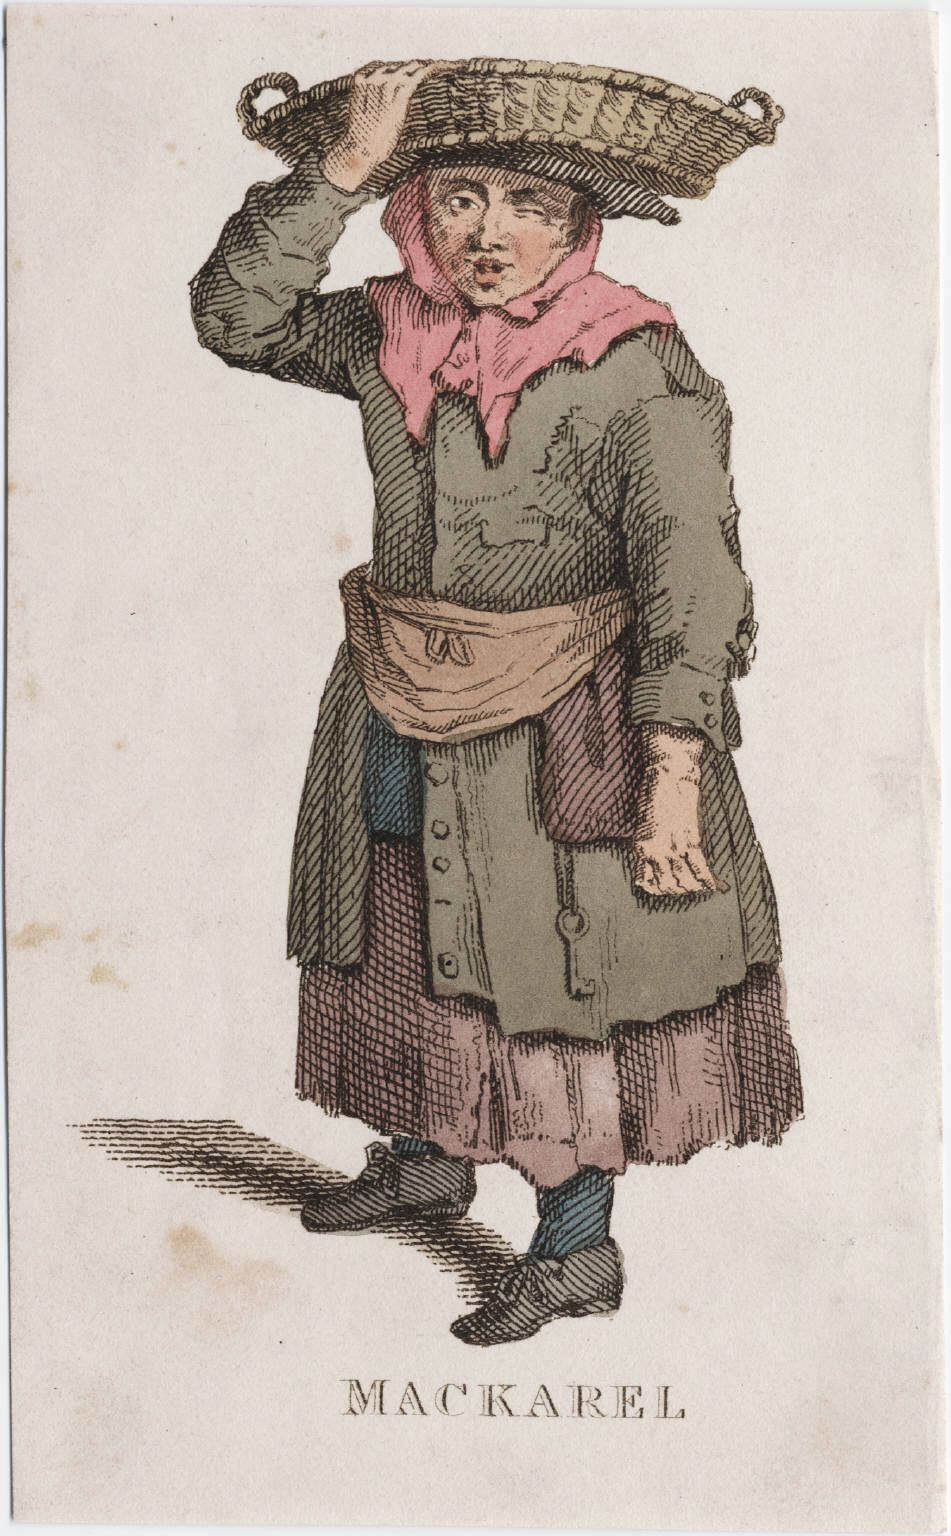 Makarel seller, apron and pocket tied over coat, England